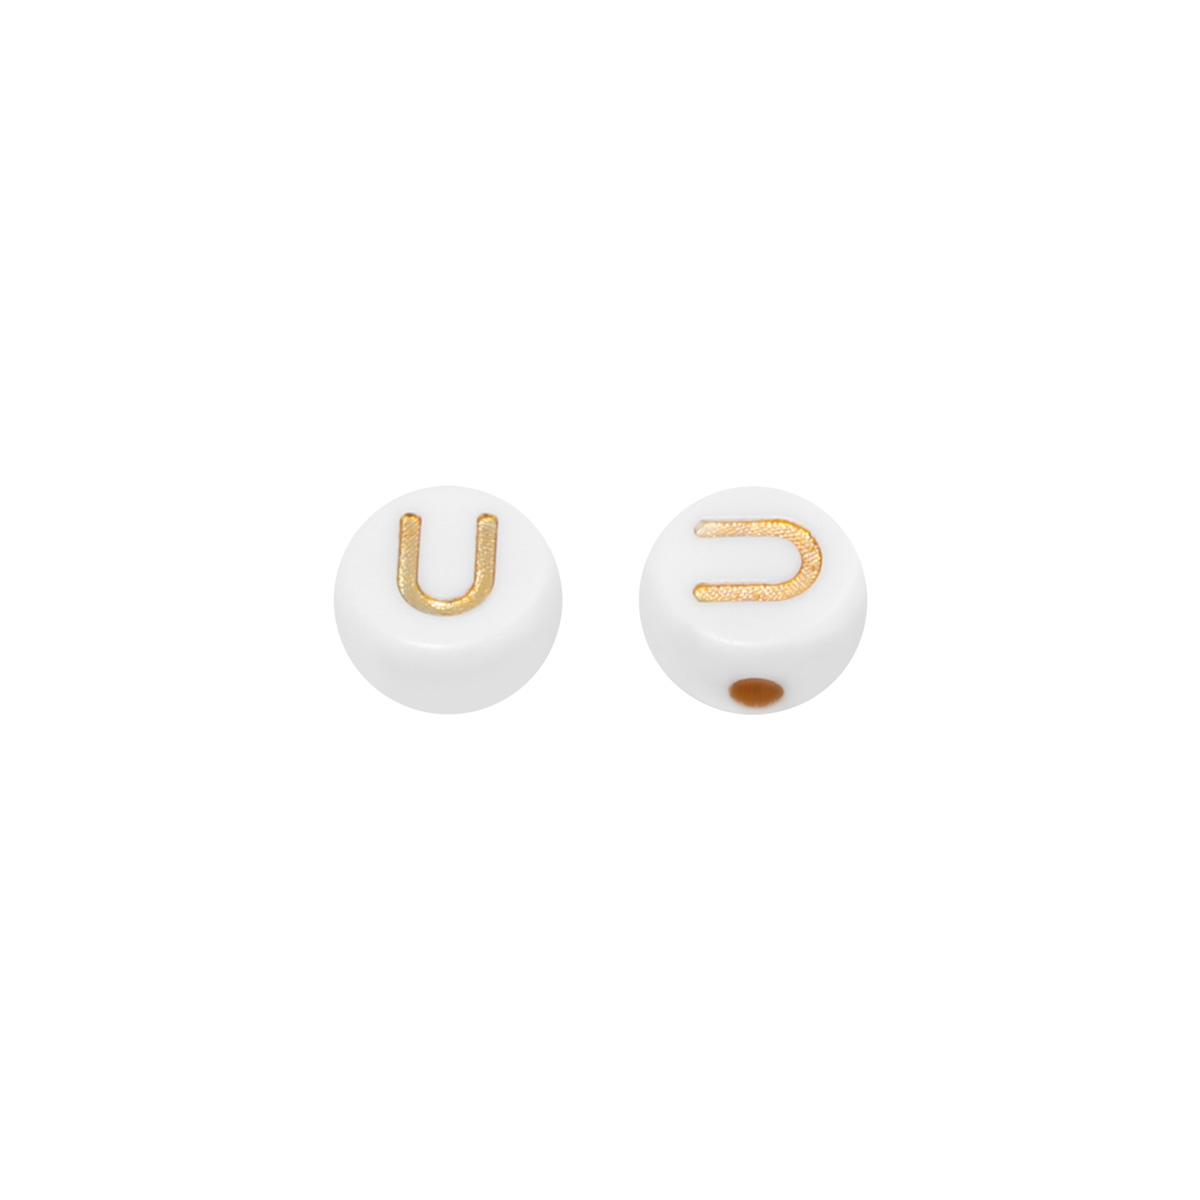 DIY Flat Beads Letter U - 7MM